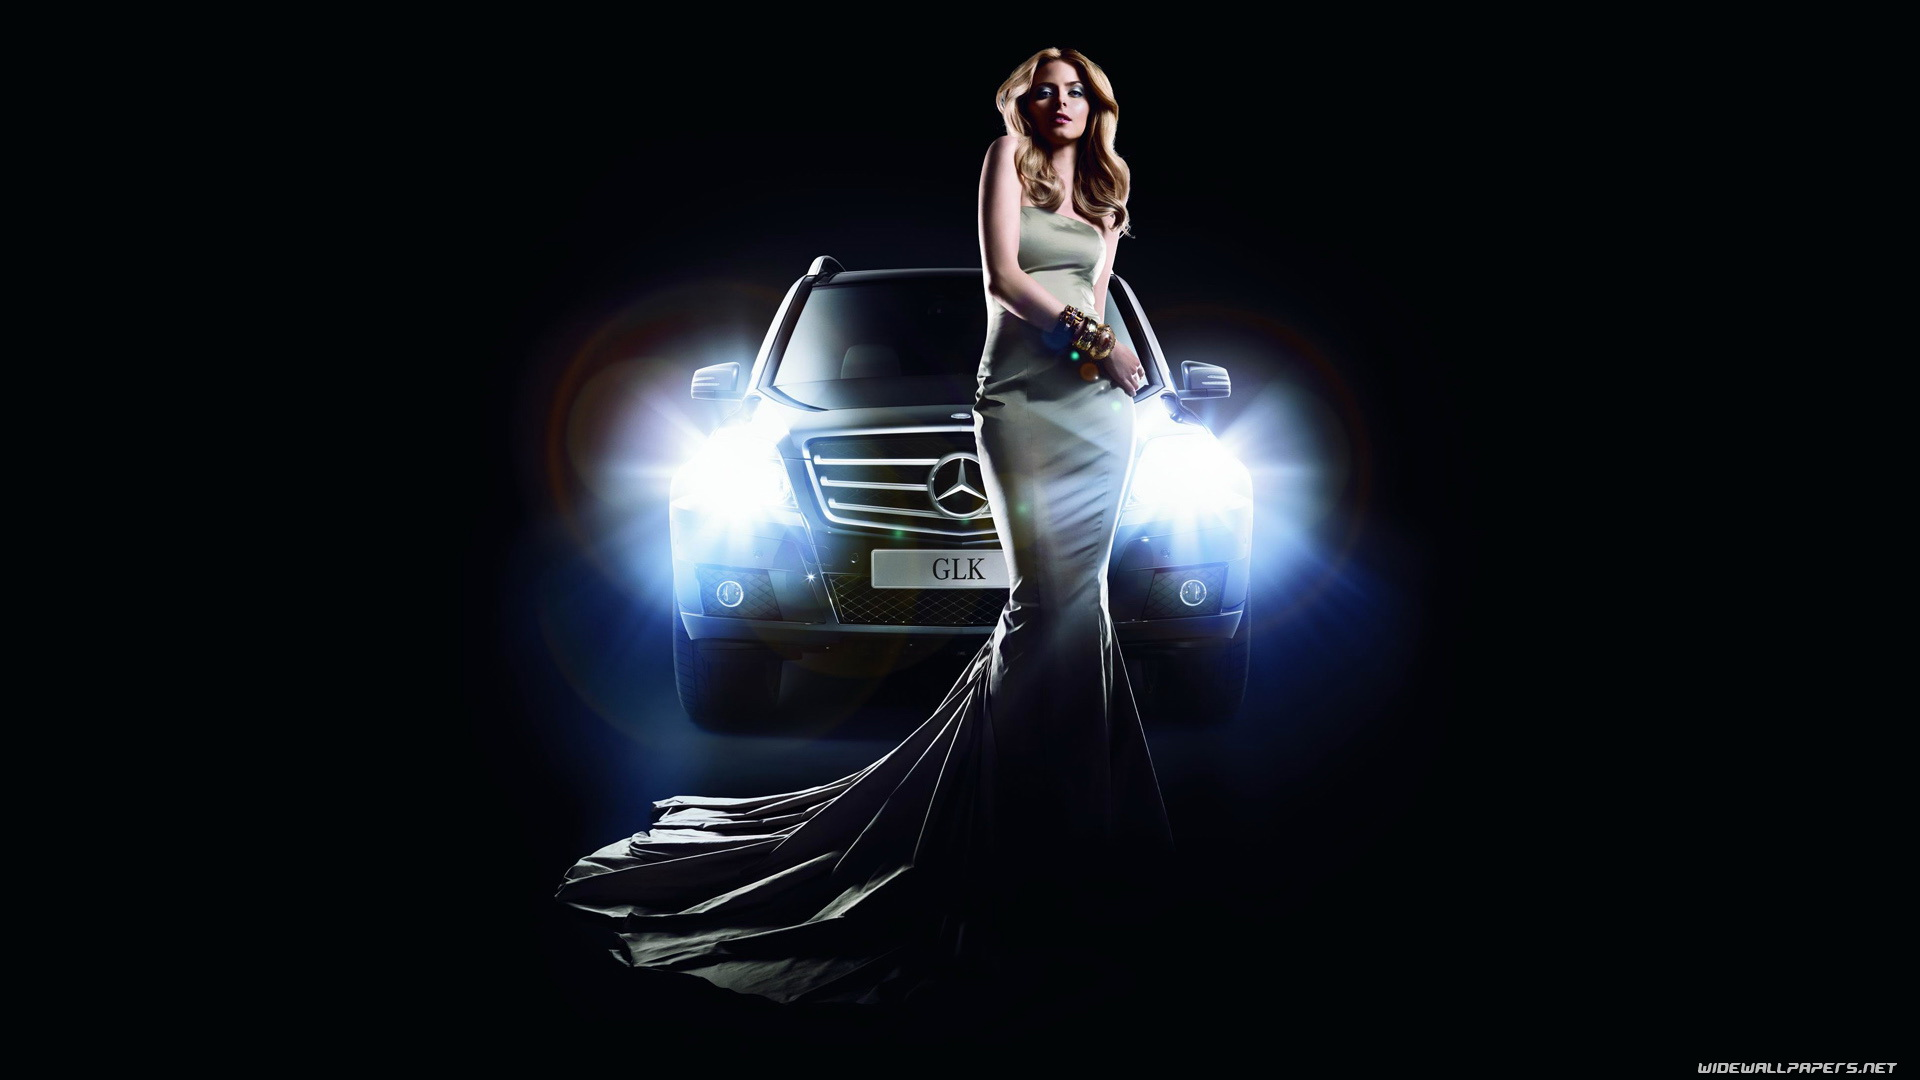 Girls Cars Hd Top Car S 1920x1080    183295  girls cars HD Wallpaper